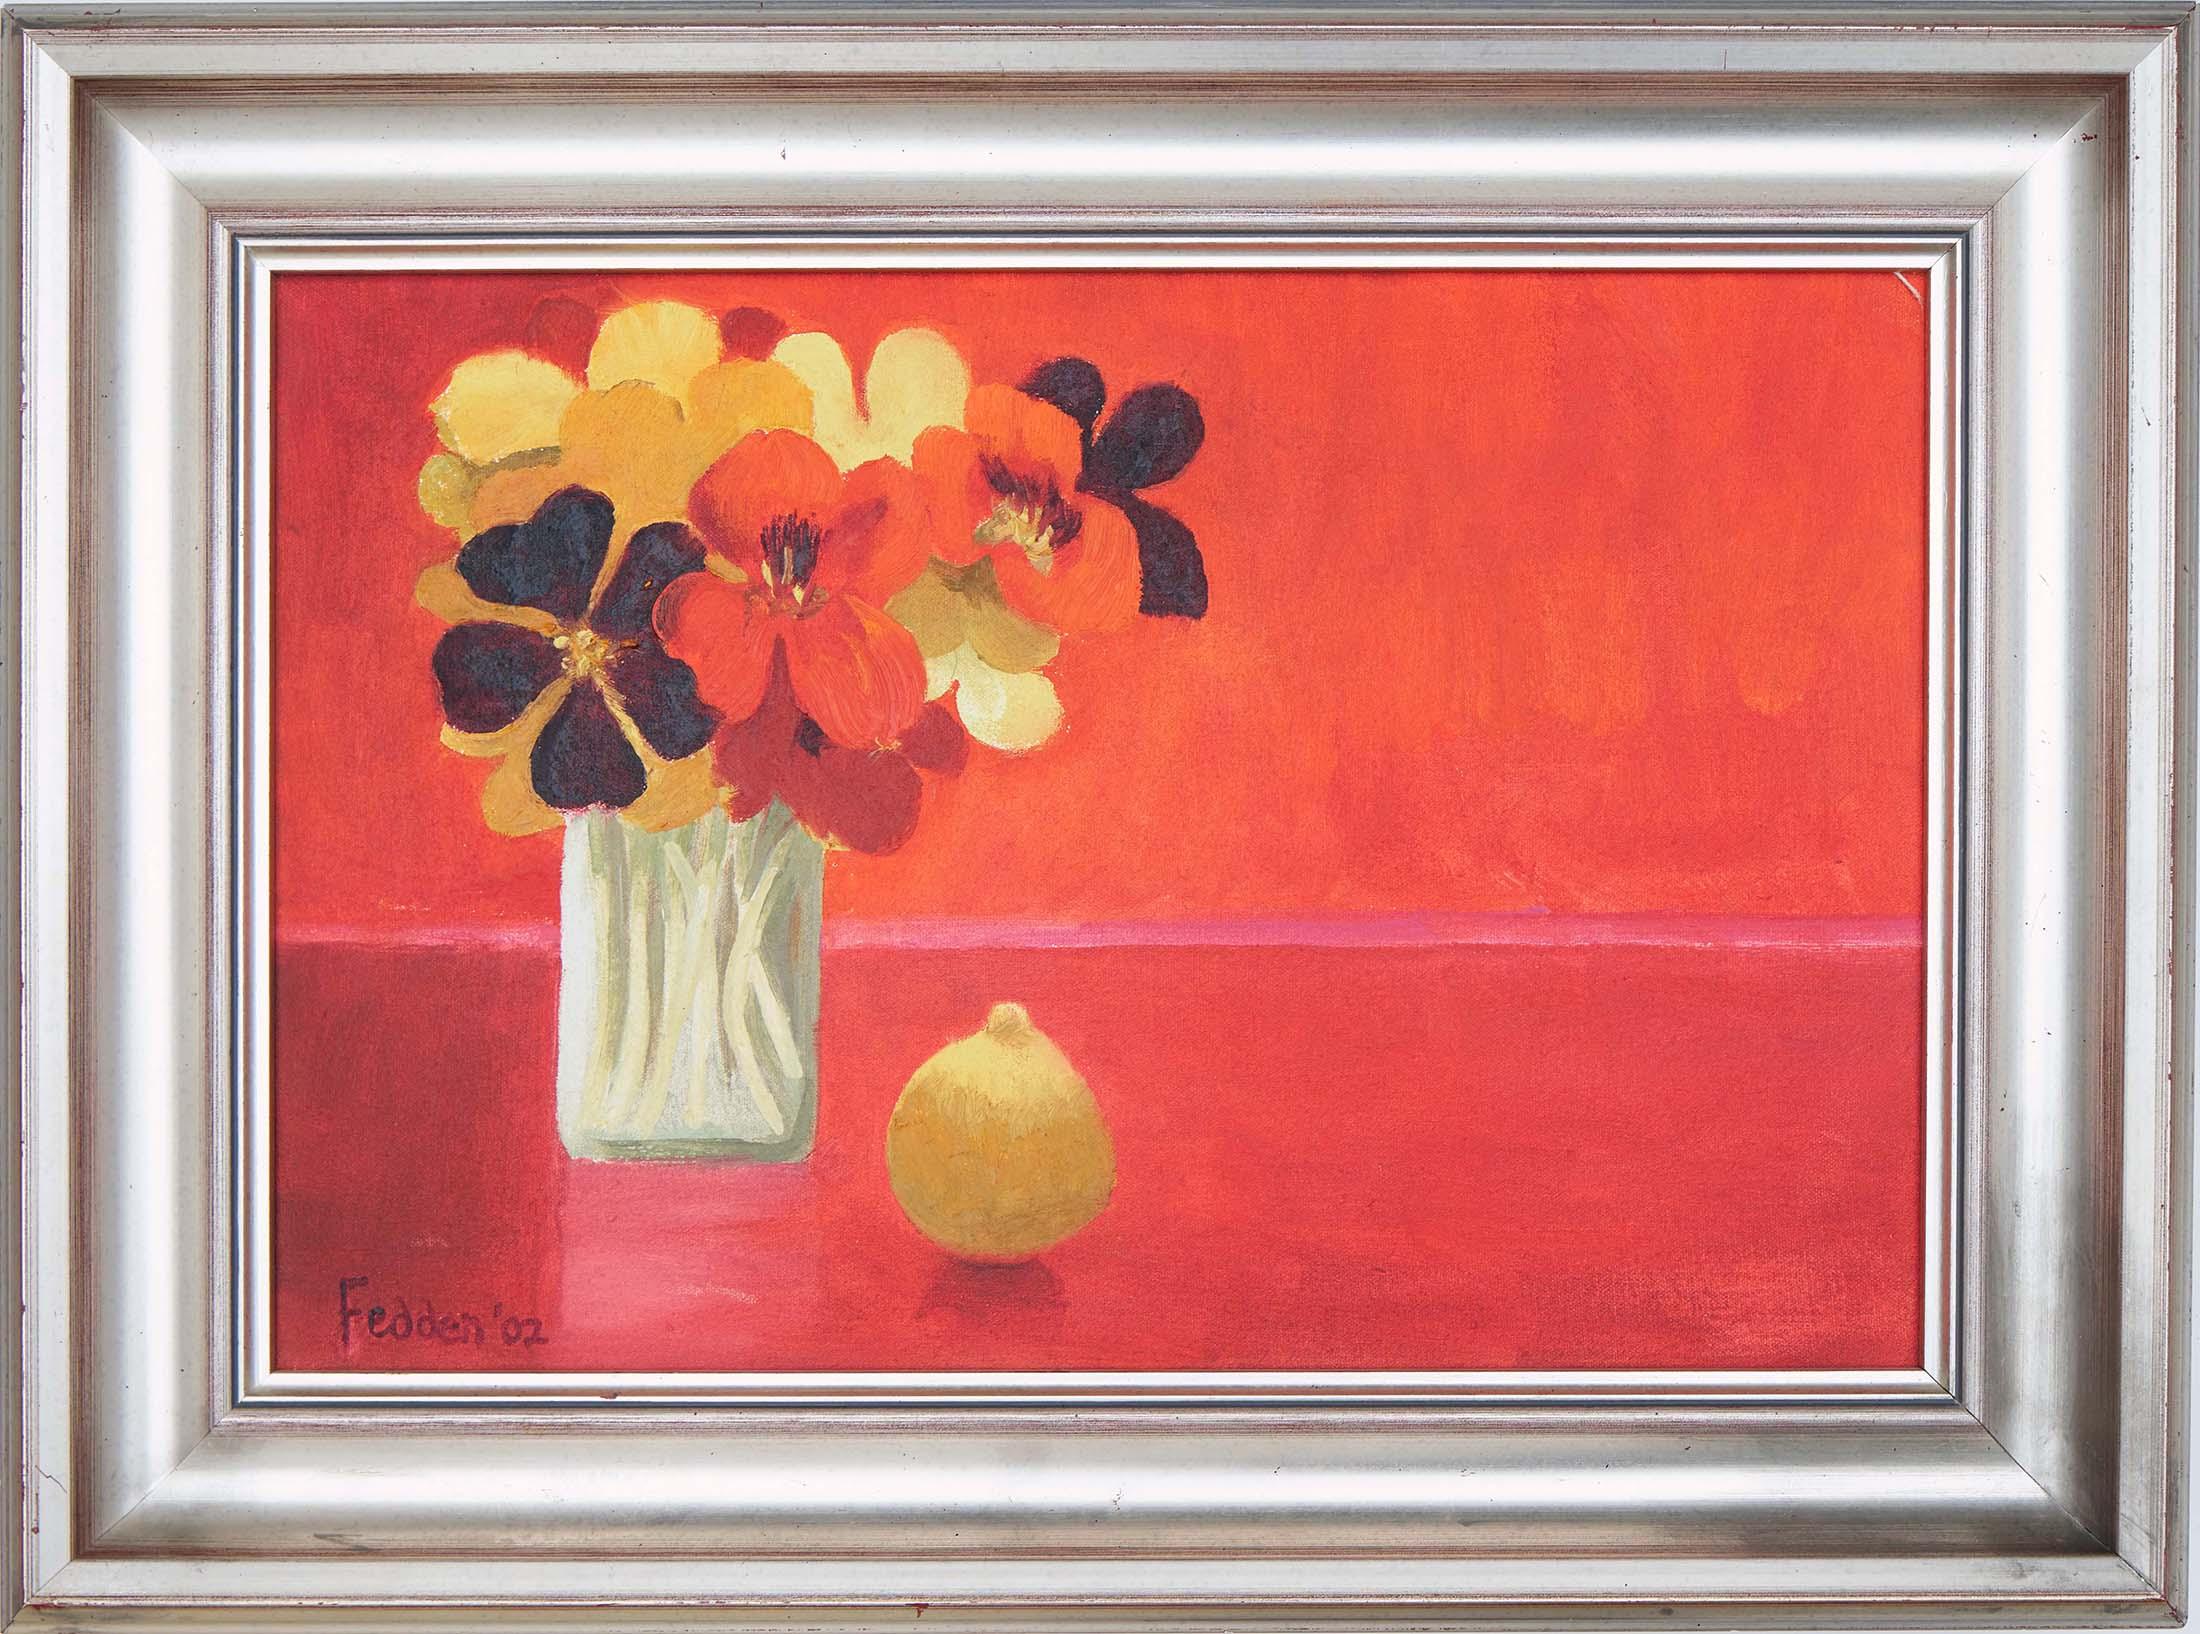 mary-fedden-nasturtiums-frame